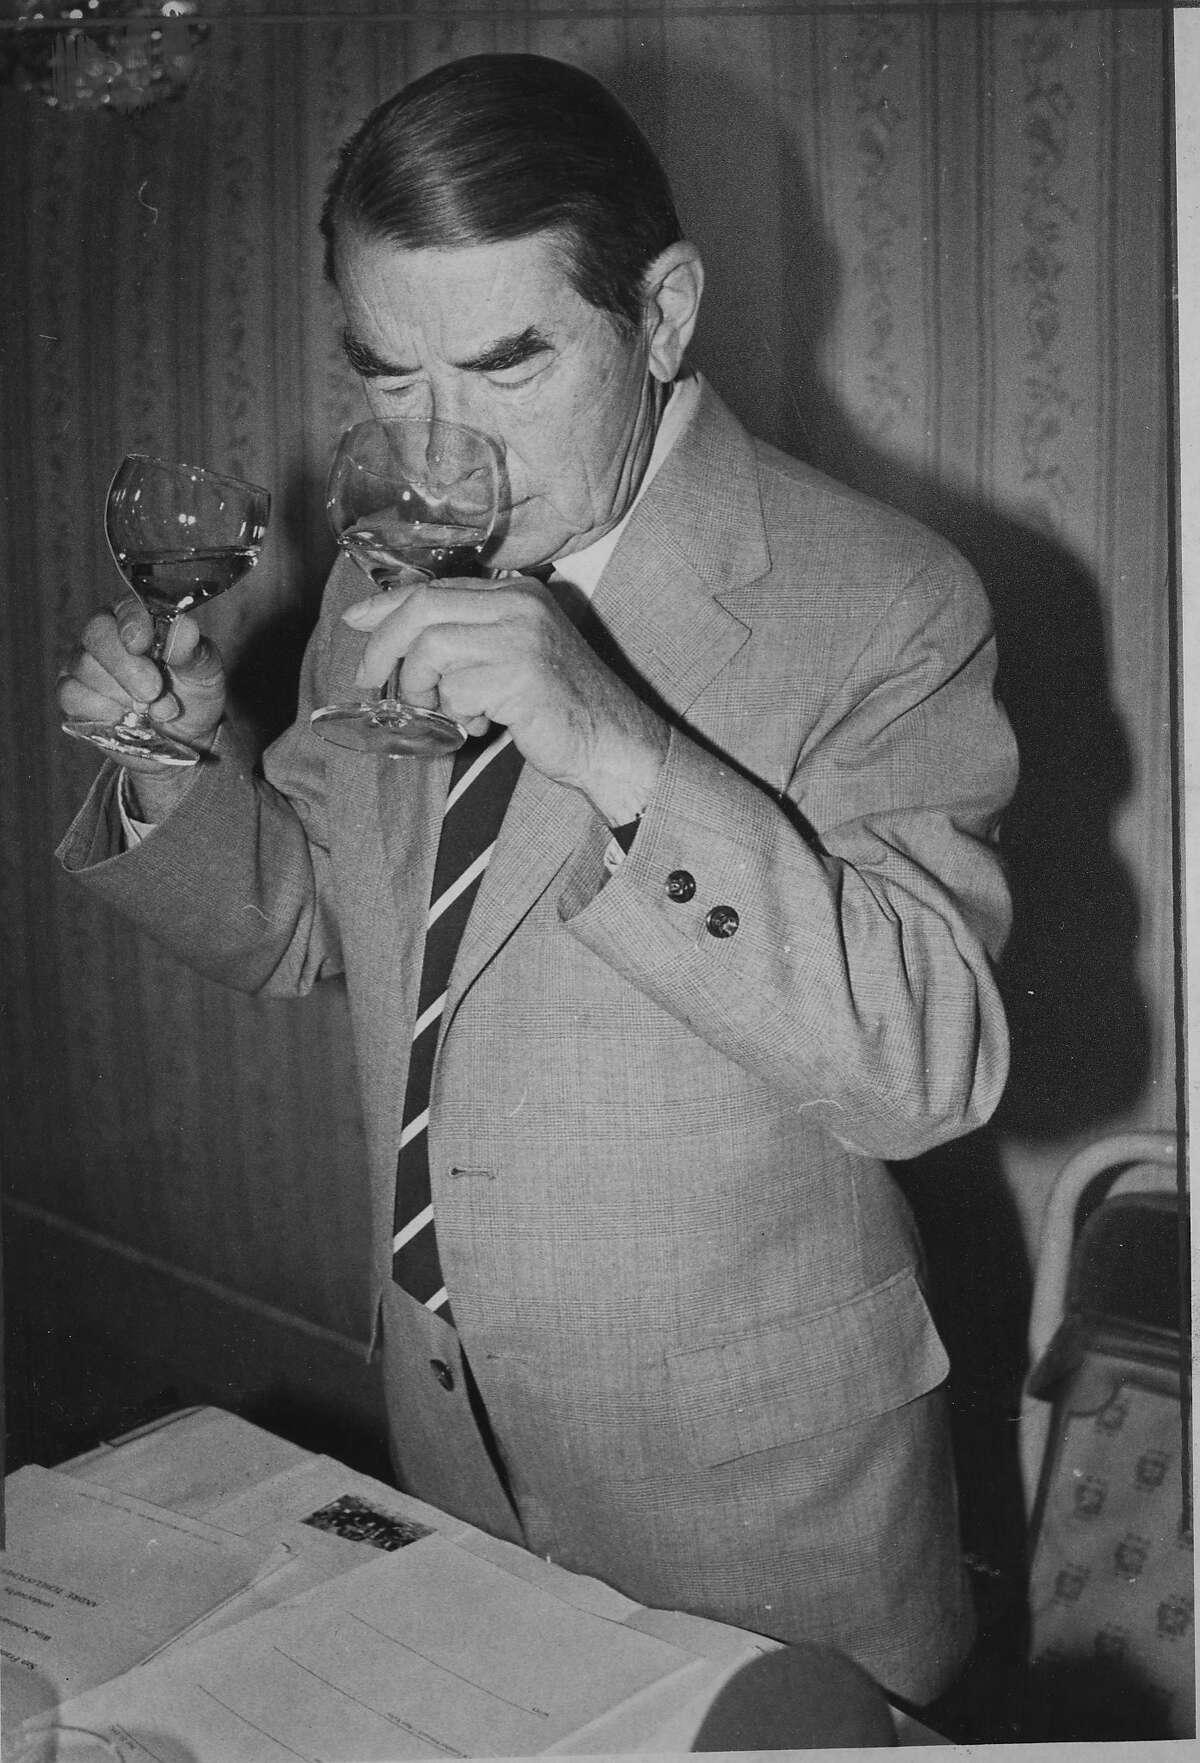 Andre Tchelistcheff, wine maker, oenologist, viticulturist Photo ran 05/24/1982, P. 50